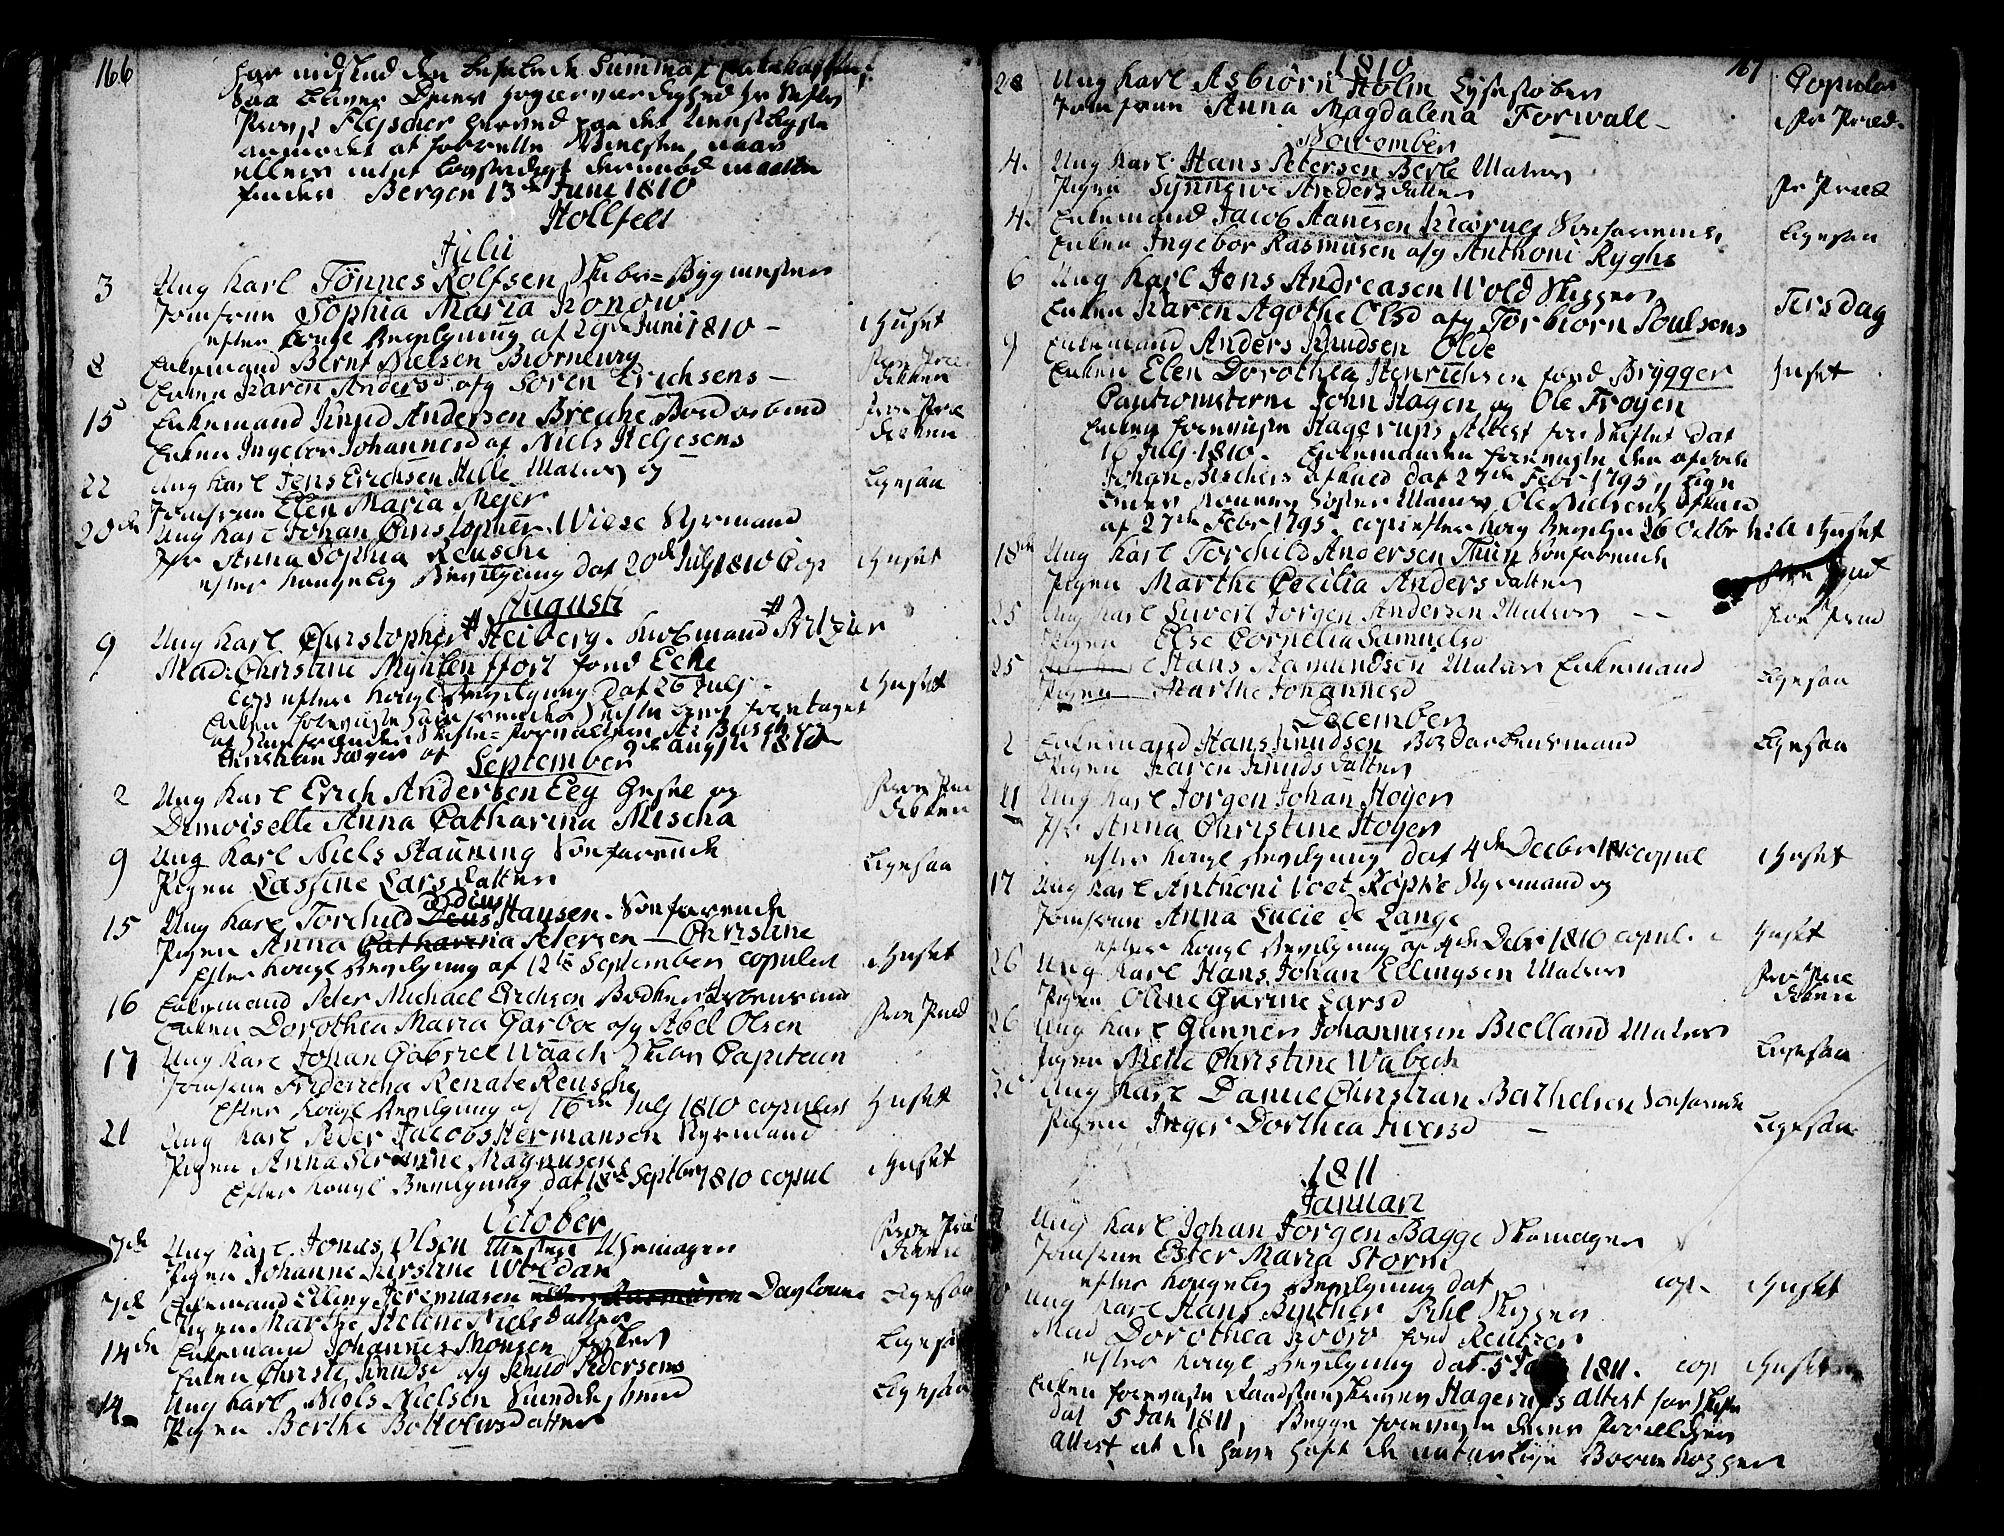 SAB, Domkirken sokneprestembete, H/Haa/L0007: Ministerialbok nr. A 7, 1725-1826, s. 166-167